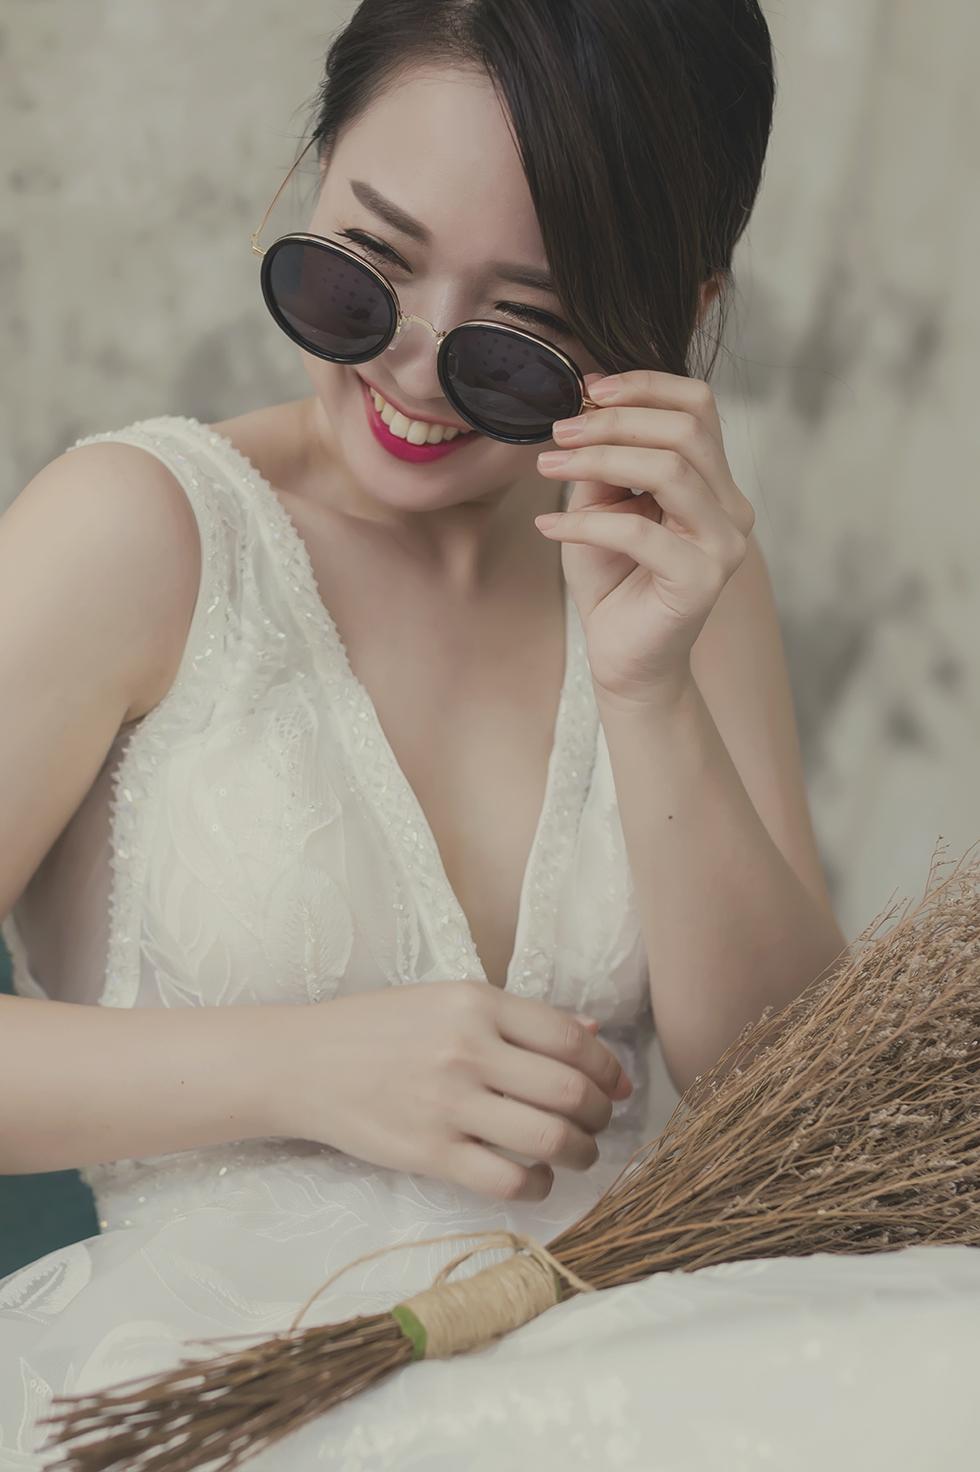 DSC_9640-2- 婚攝, 婚禮攝影, 婚紗包套, 婚禮紀錄, 親子寫真, 美式婚紗攝影, 自助婚紗, 小資婚紗, 婚攝推薦, 家庭寫真, 孕婦寫真, 顏氏牧場婚攝, 林酒店婚攝, 萊特薇庭婚攝, 婚攝推薦, 婚紗婚攝, 婚紗攝影, 婚禮攝影推薦, 自助婚紗